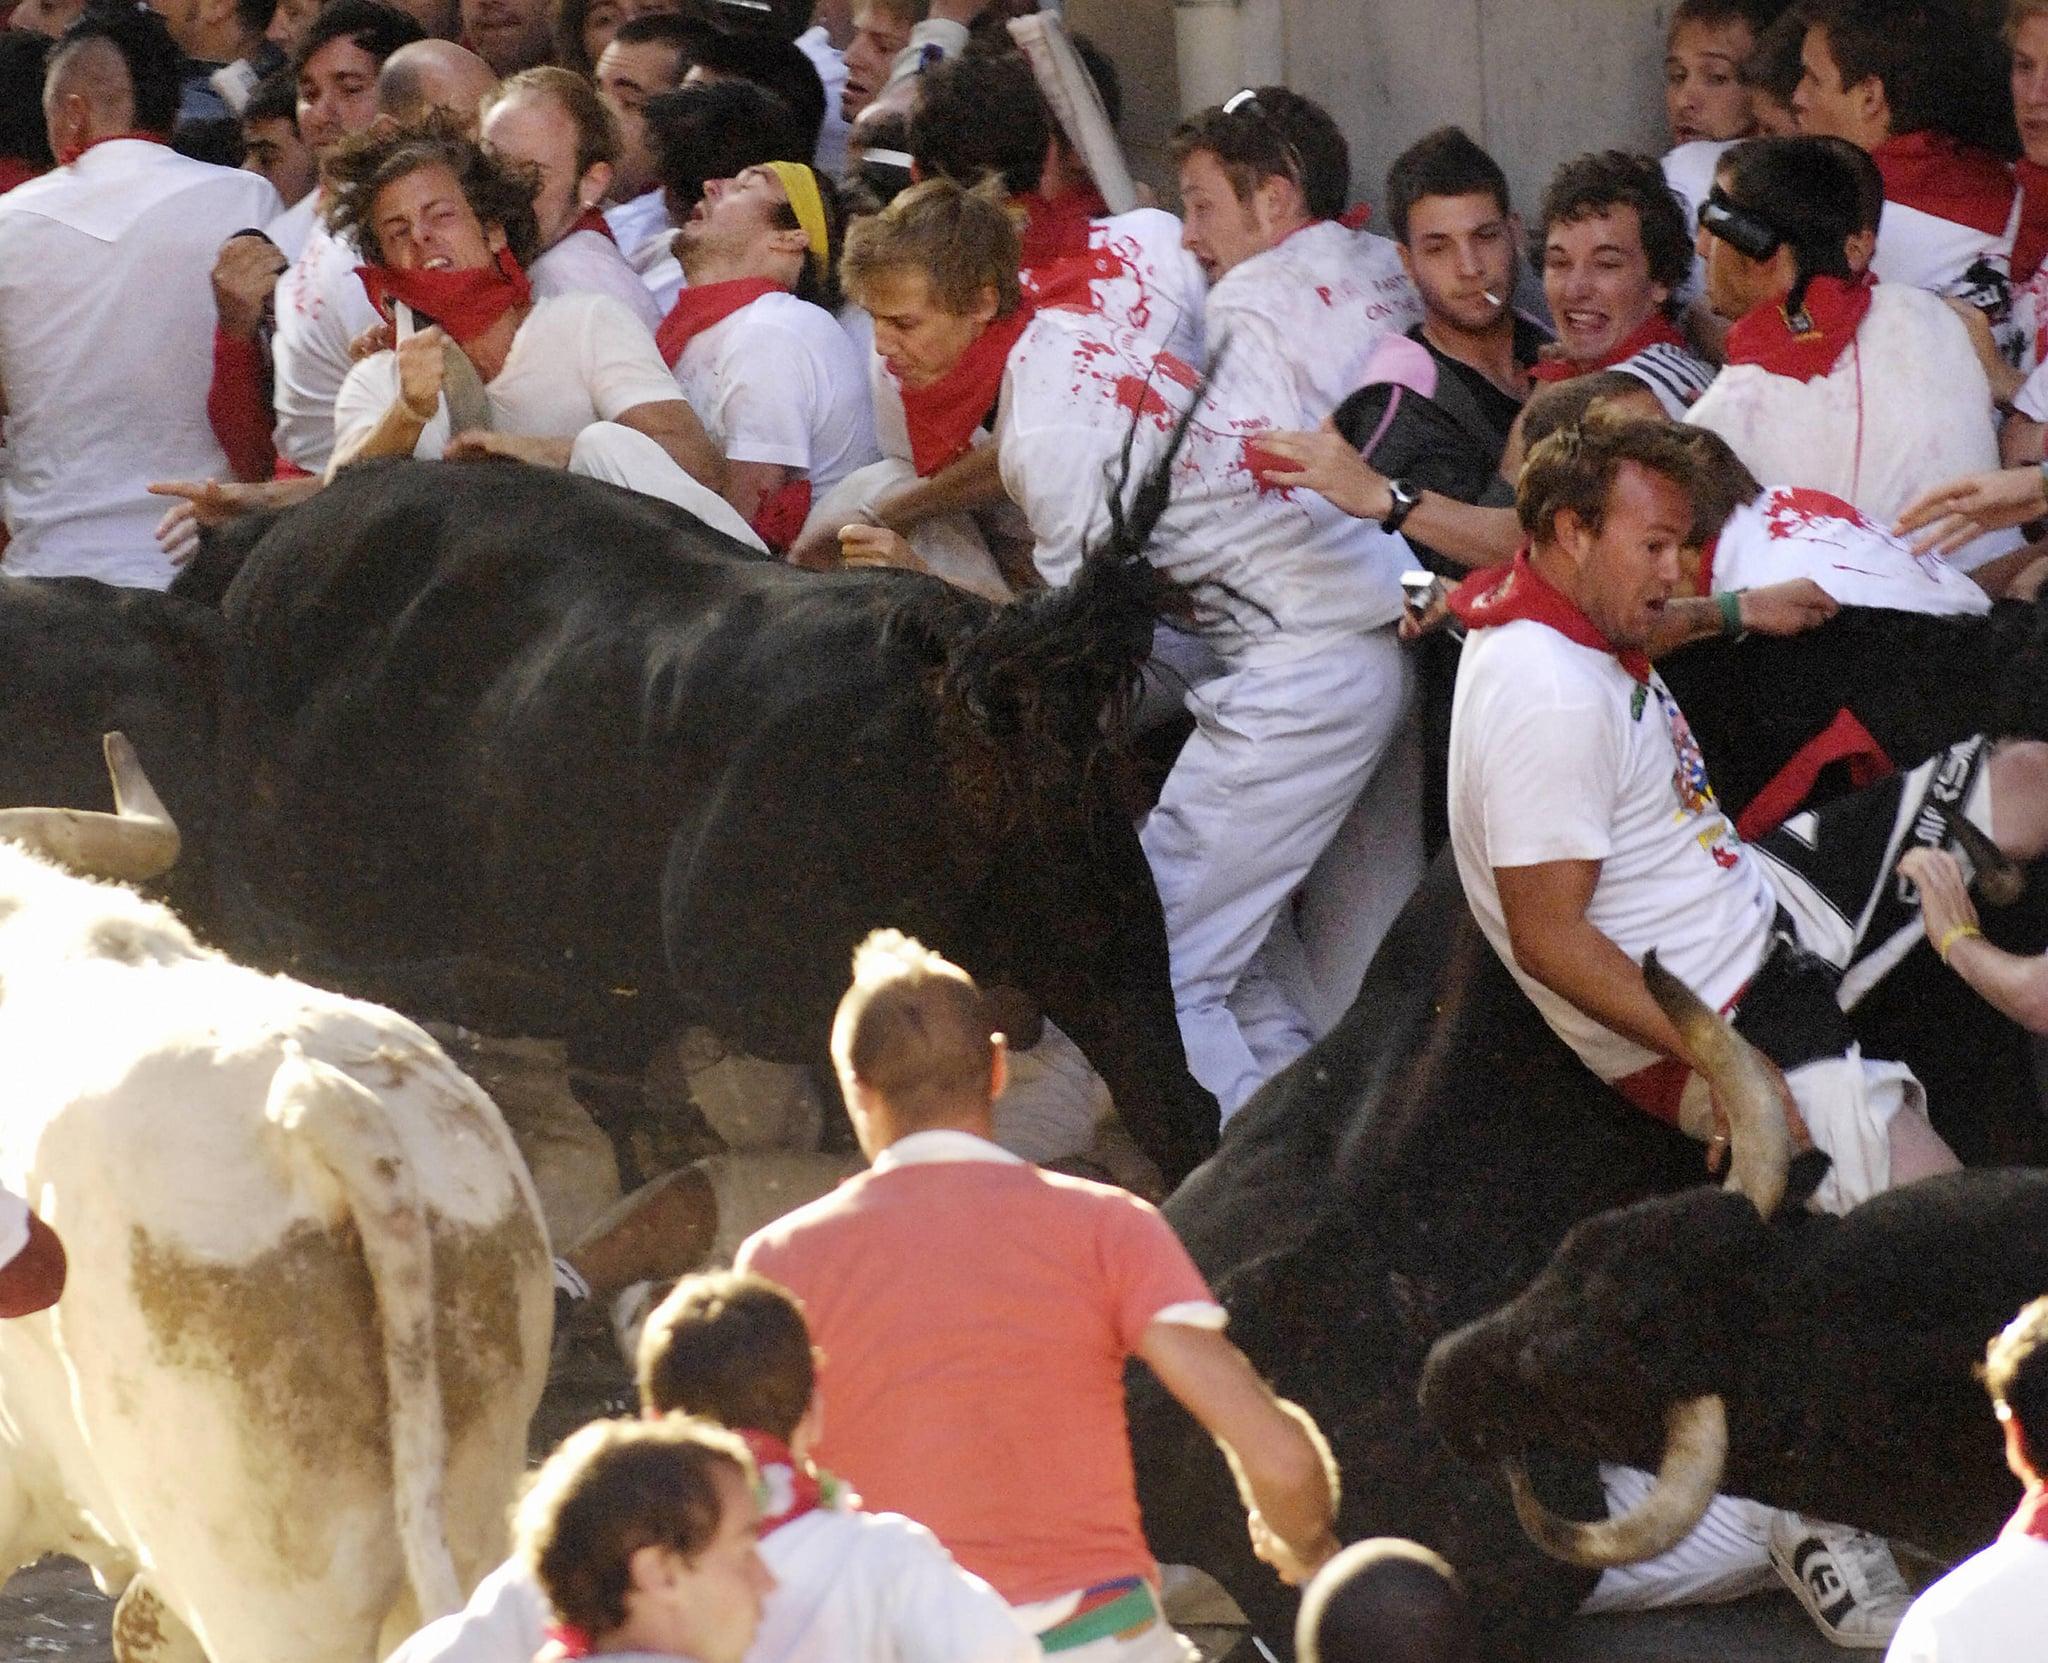 Participants are charged by Conde de la Corte fighting bulls.